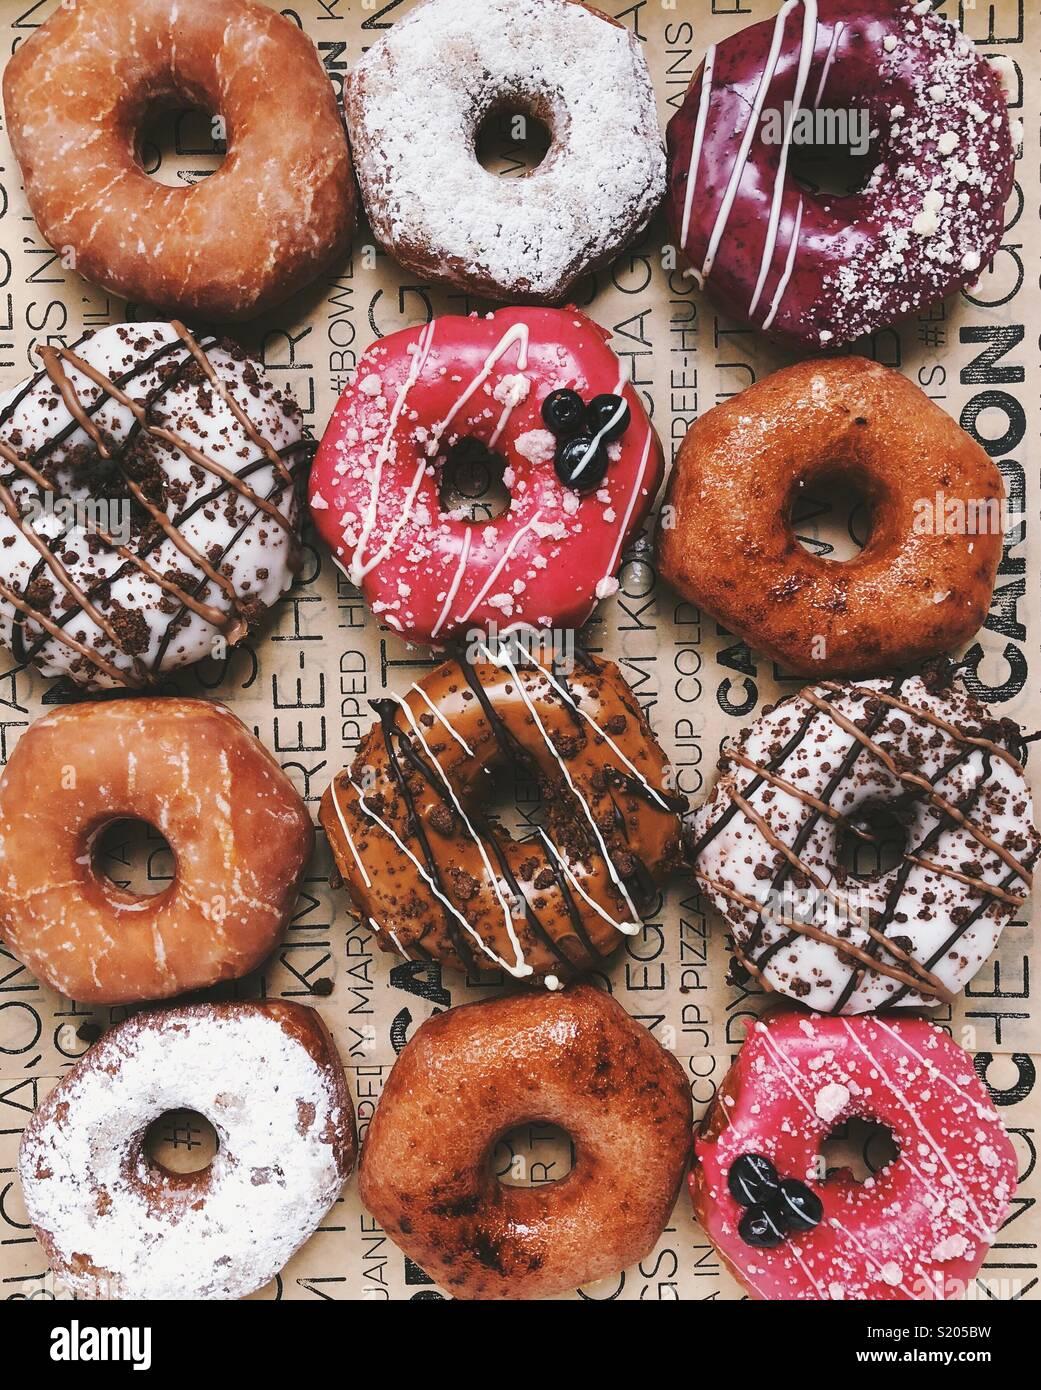 Hole Foods - Stock Image